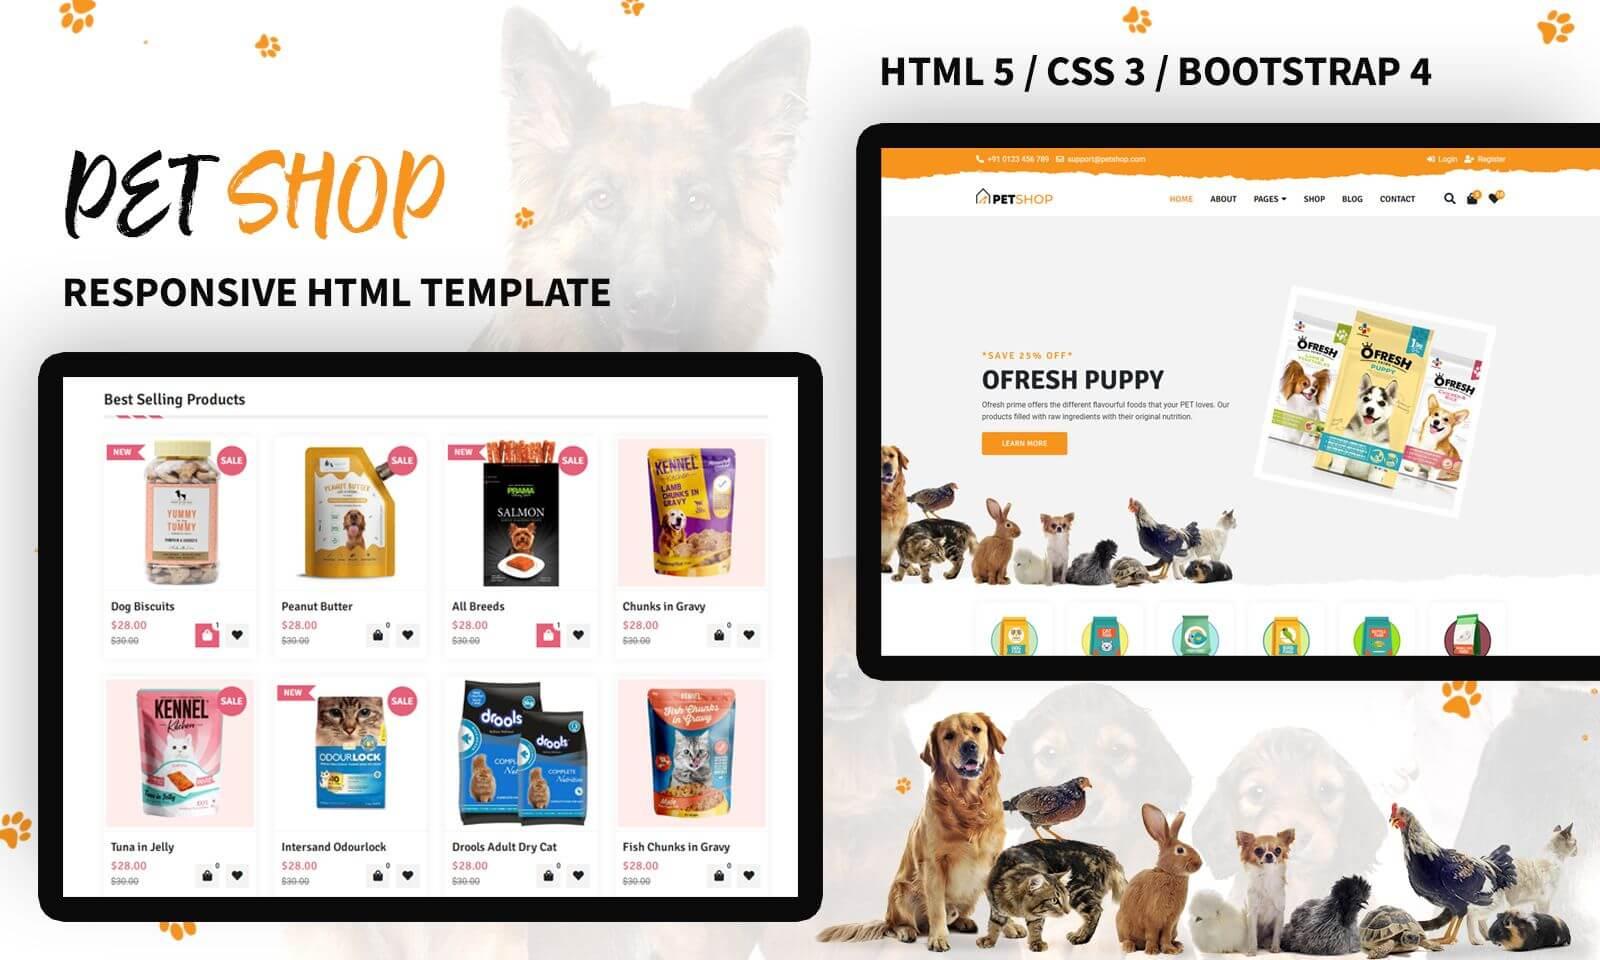 """Pet Store Responsive Website Template"" 响应式网页模板 #138611"